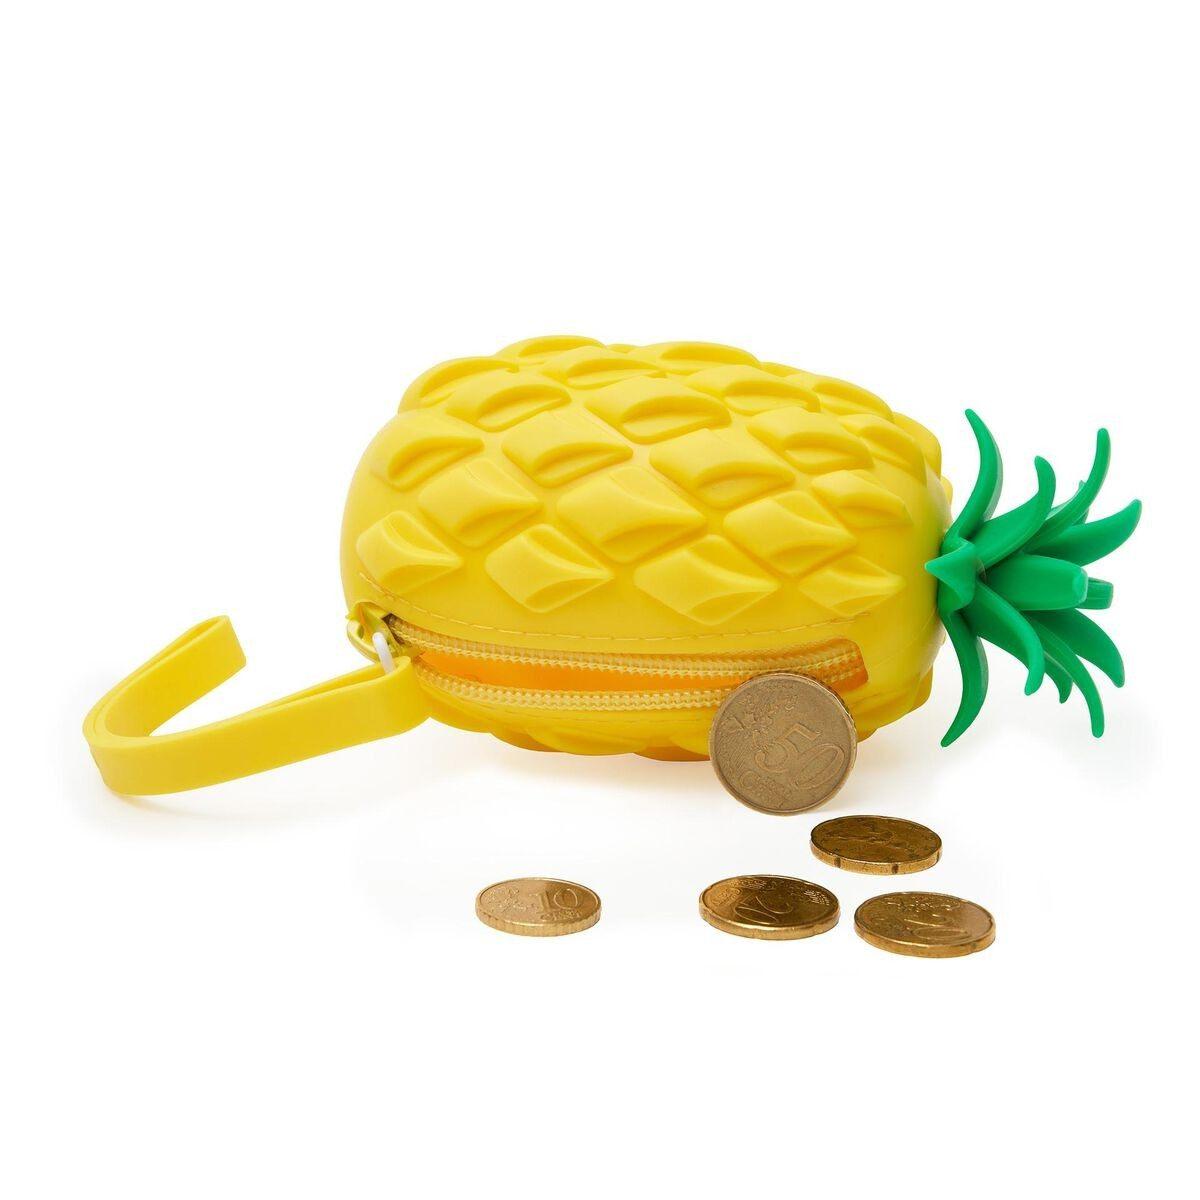 Legami VSP0001 Πορτοφόλι Σιλικόνης - Pineapple Yellow/Green